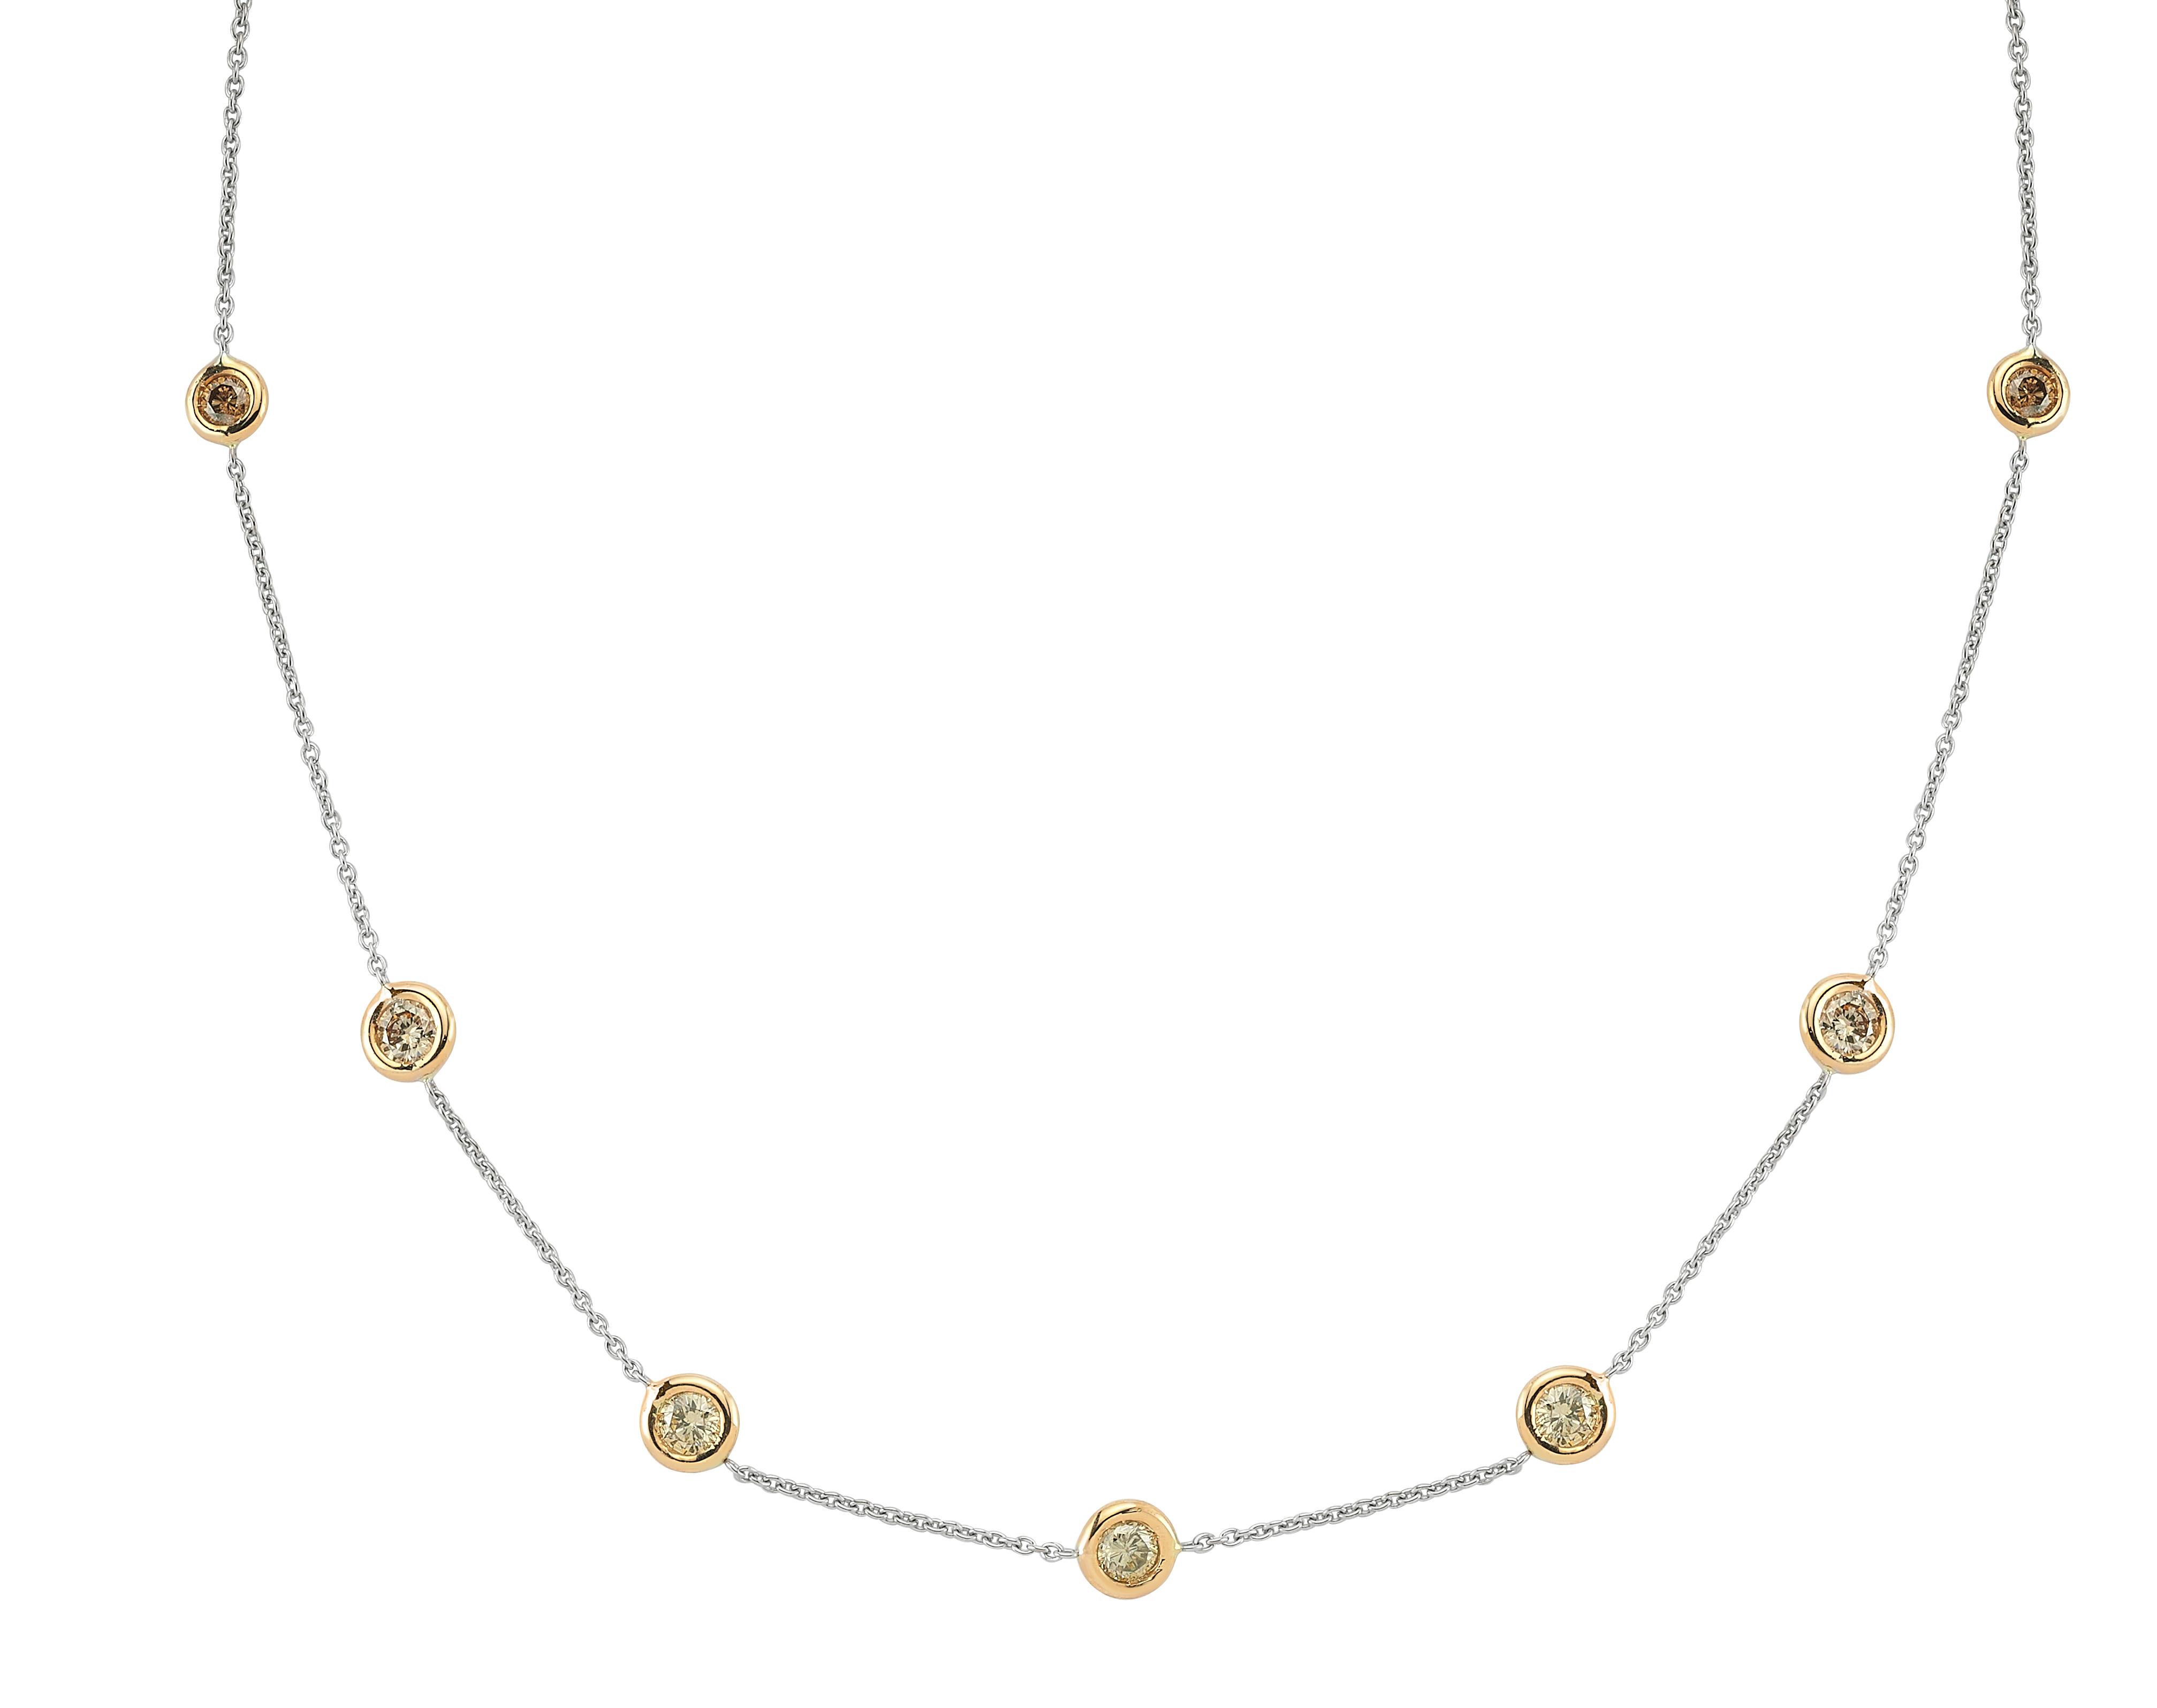 Brown Pırlanta Altın Kolye - 4003003